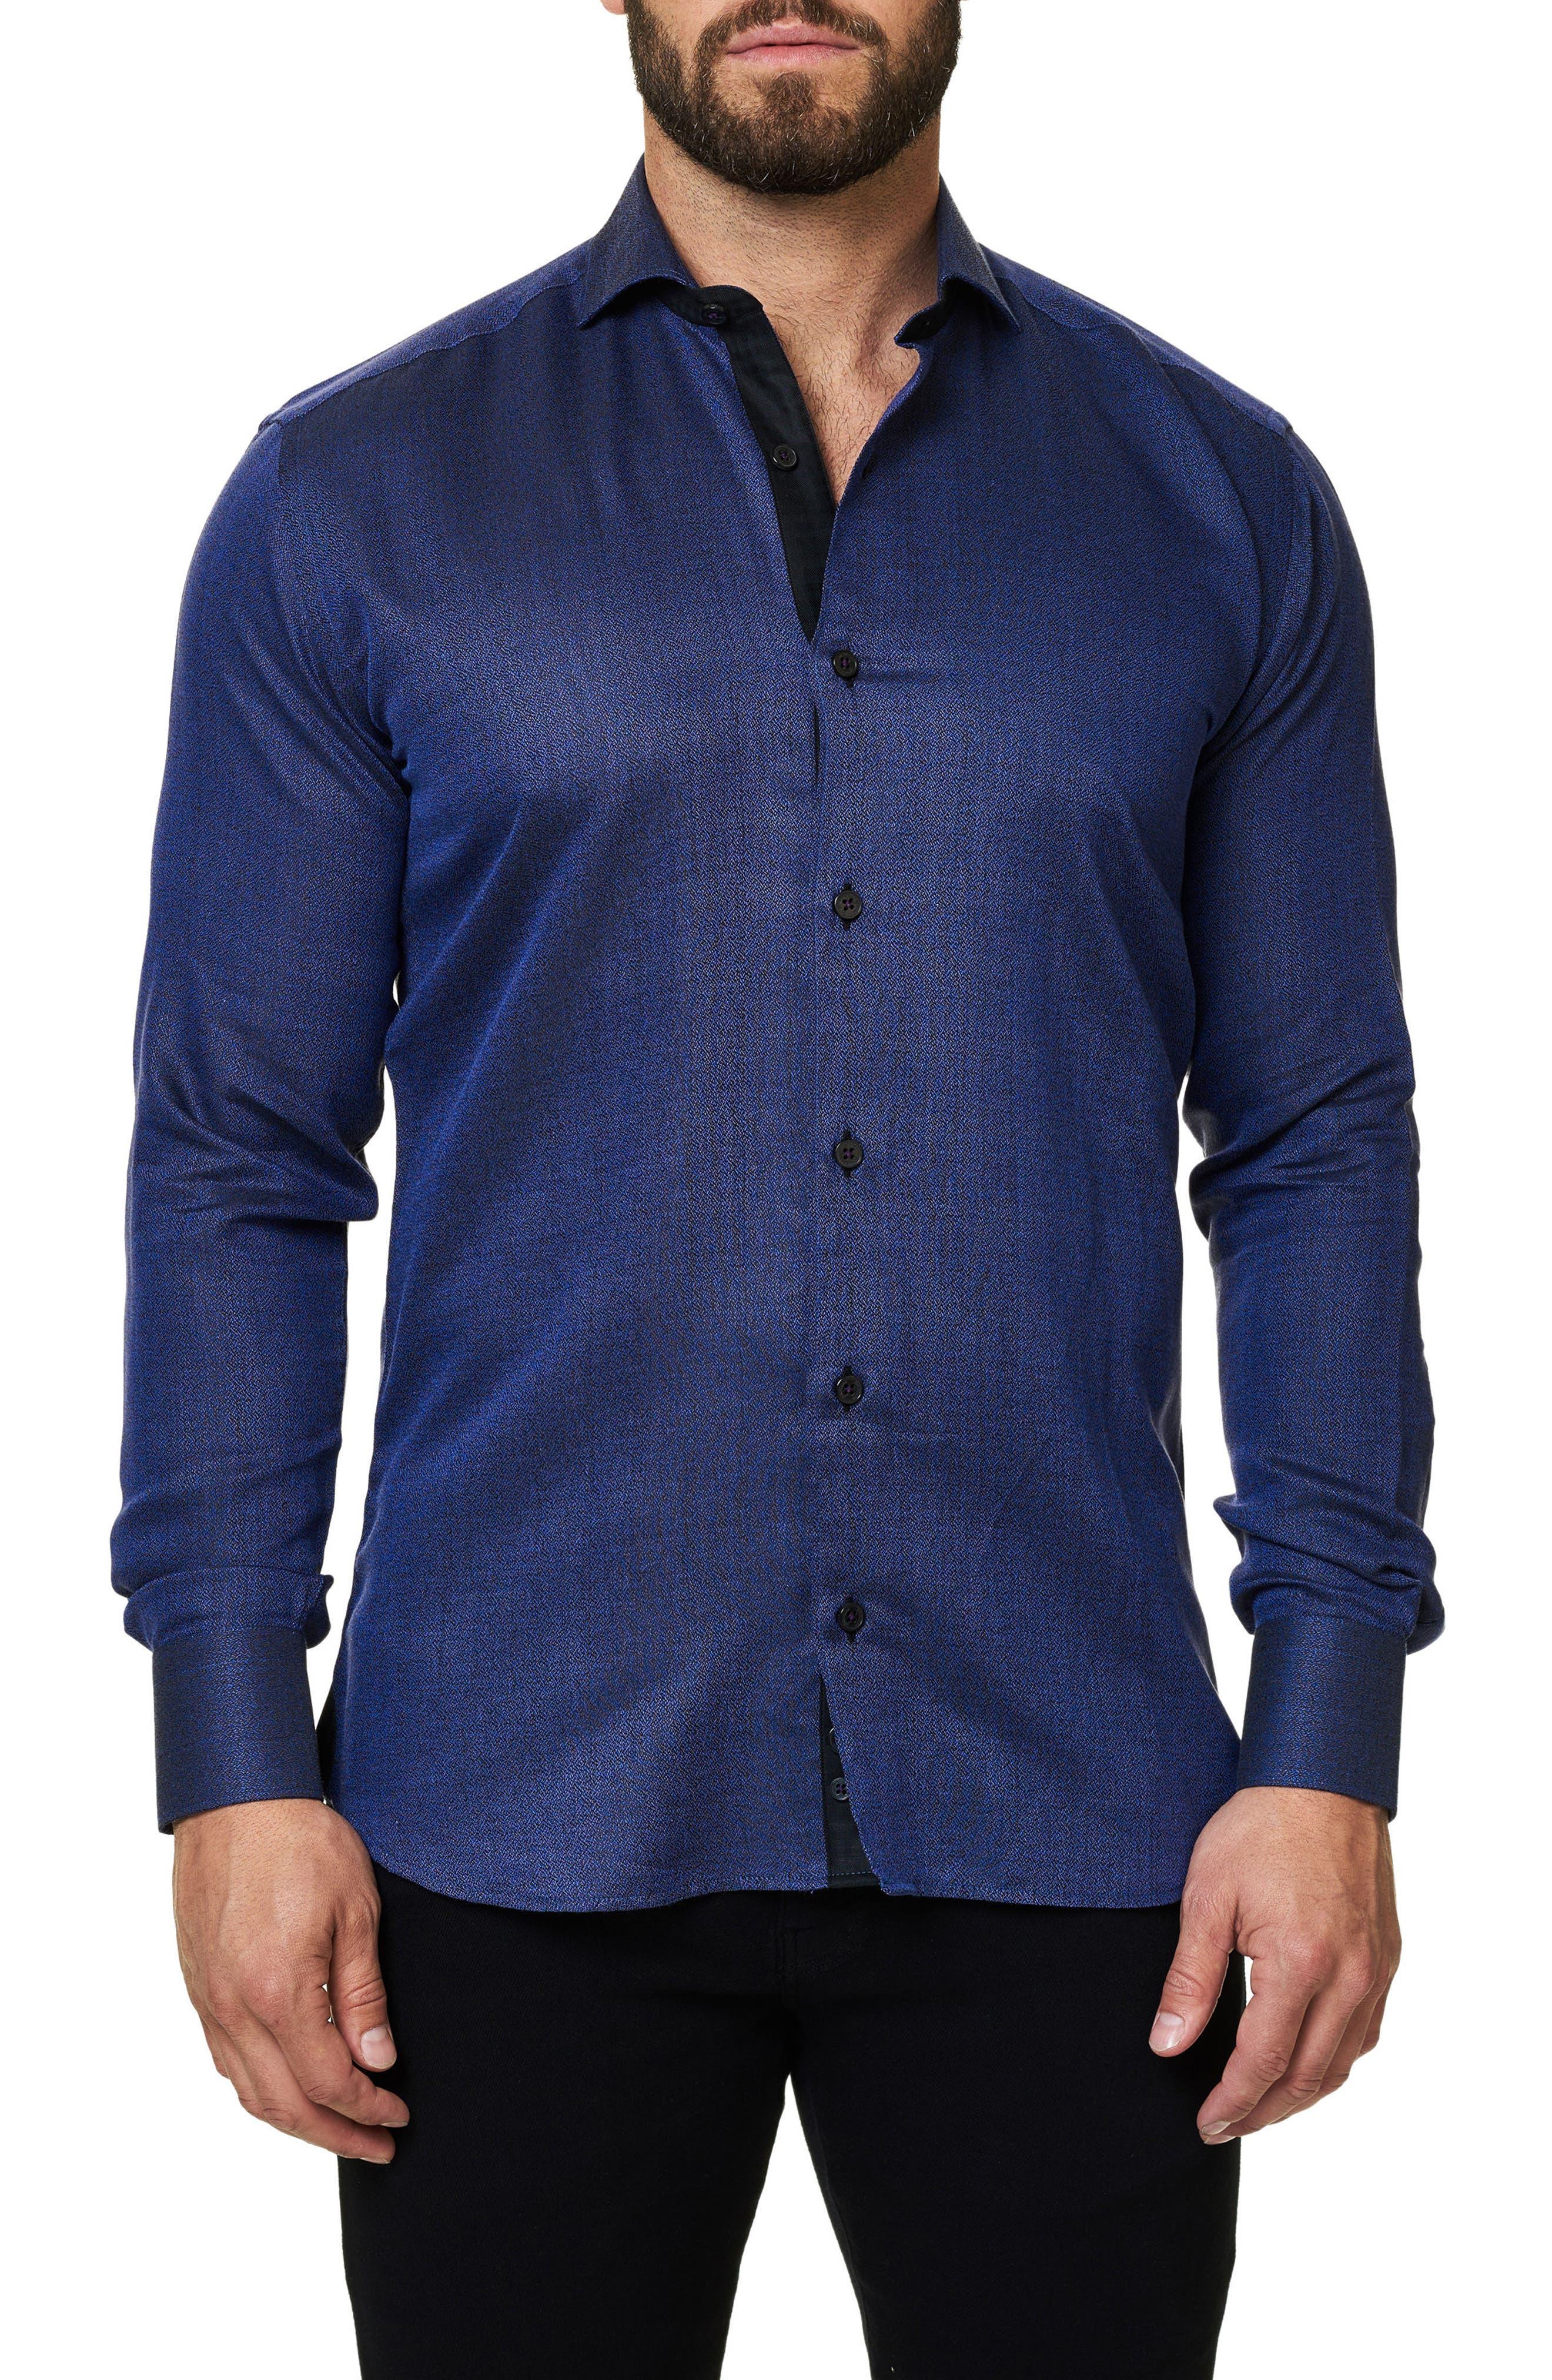 Alternate Image 1 Selected - Maceoo Trim Fit Sport Shirt